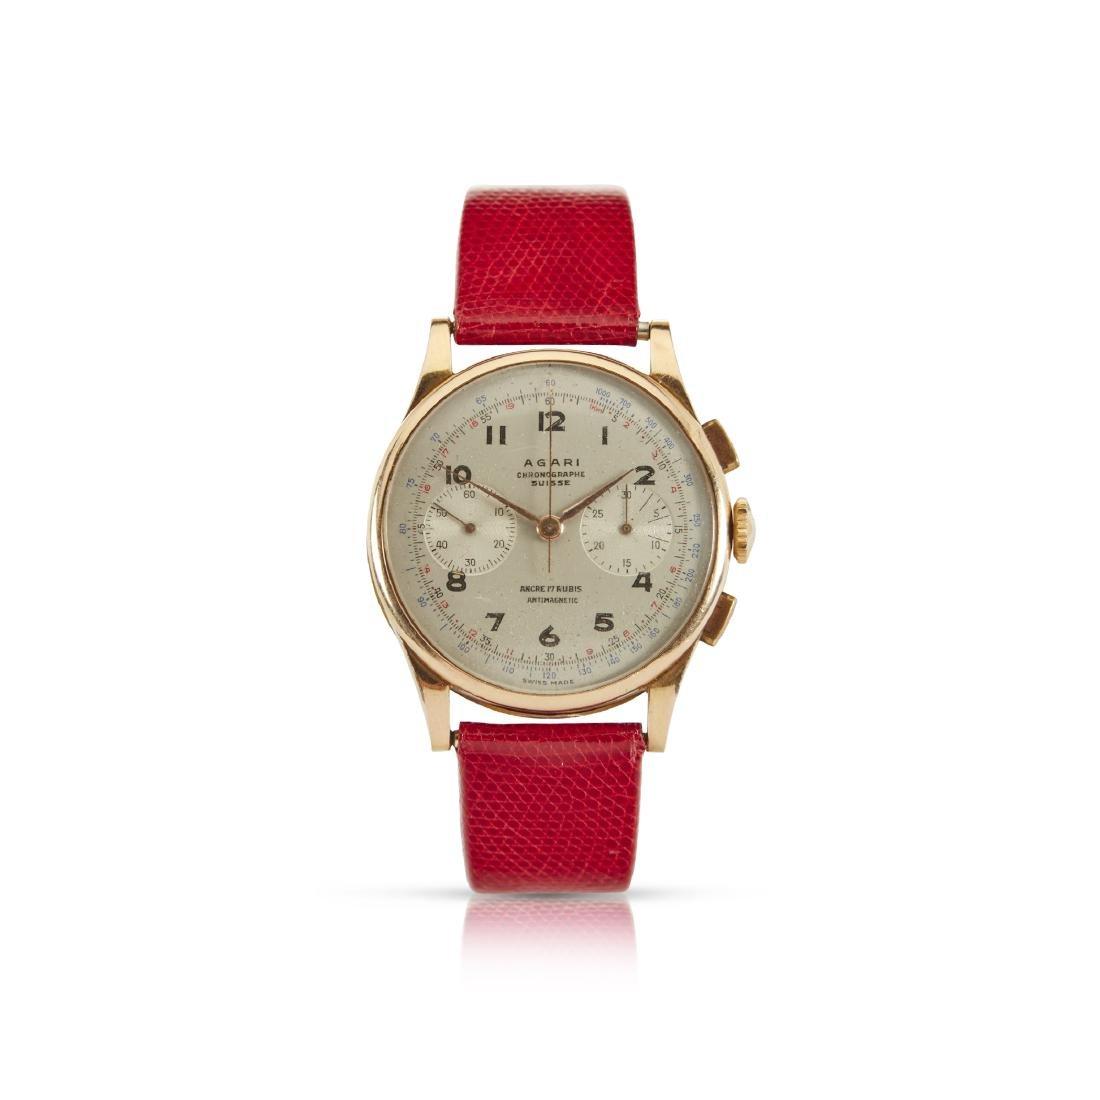 Agari, Chronographe Suisse Wristwatch